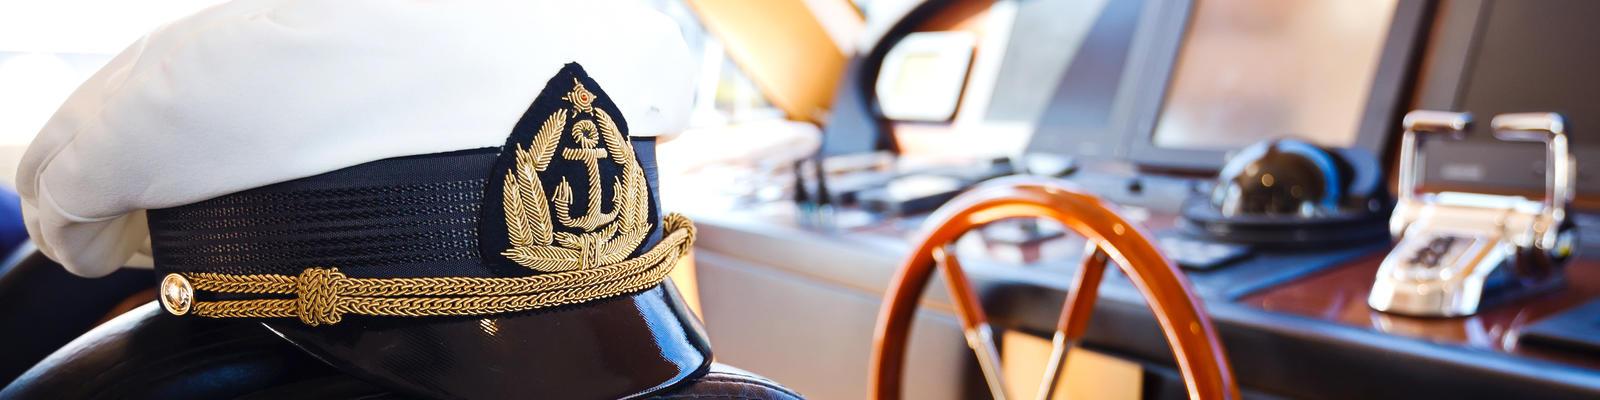 The Salary Of A Cruise Ship Captain Sapling - Imagez co